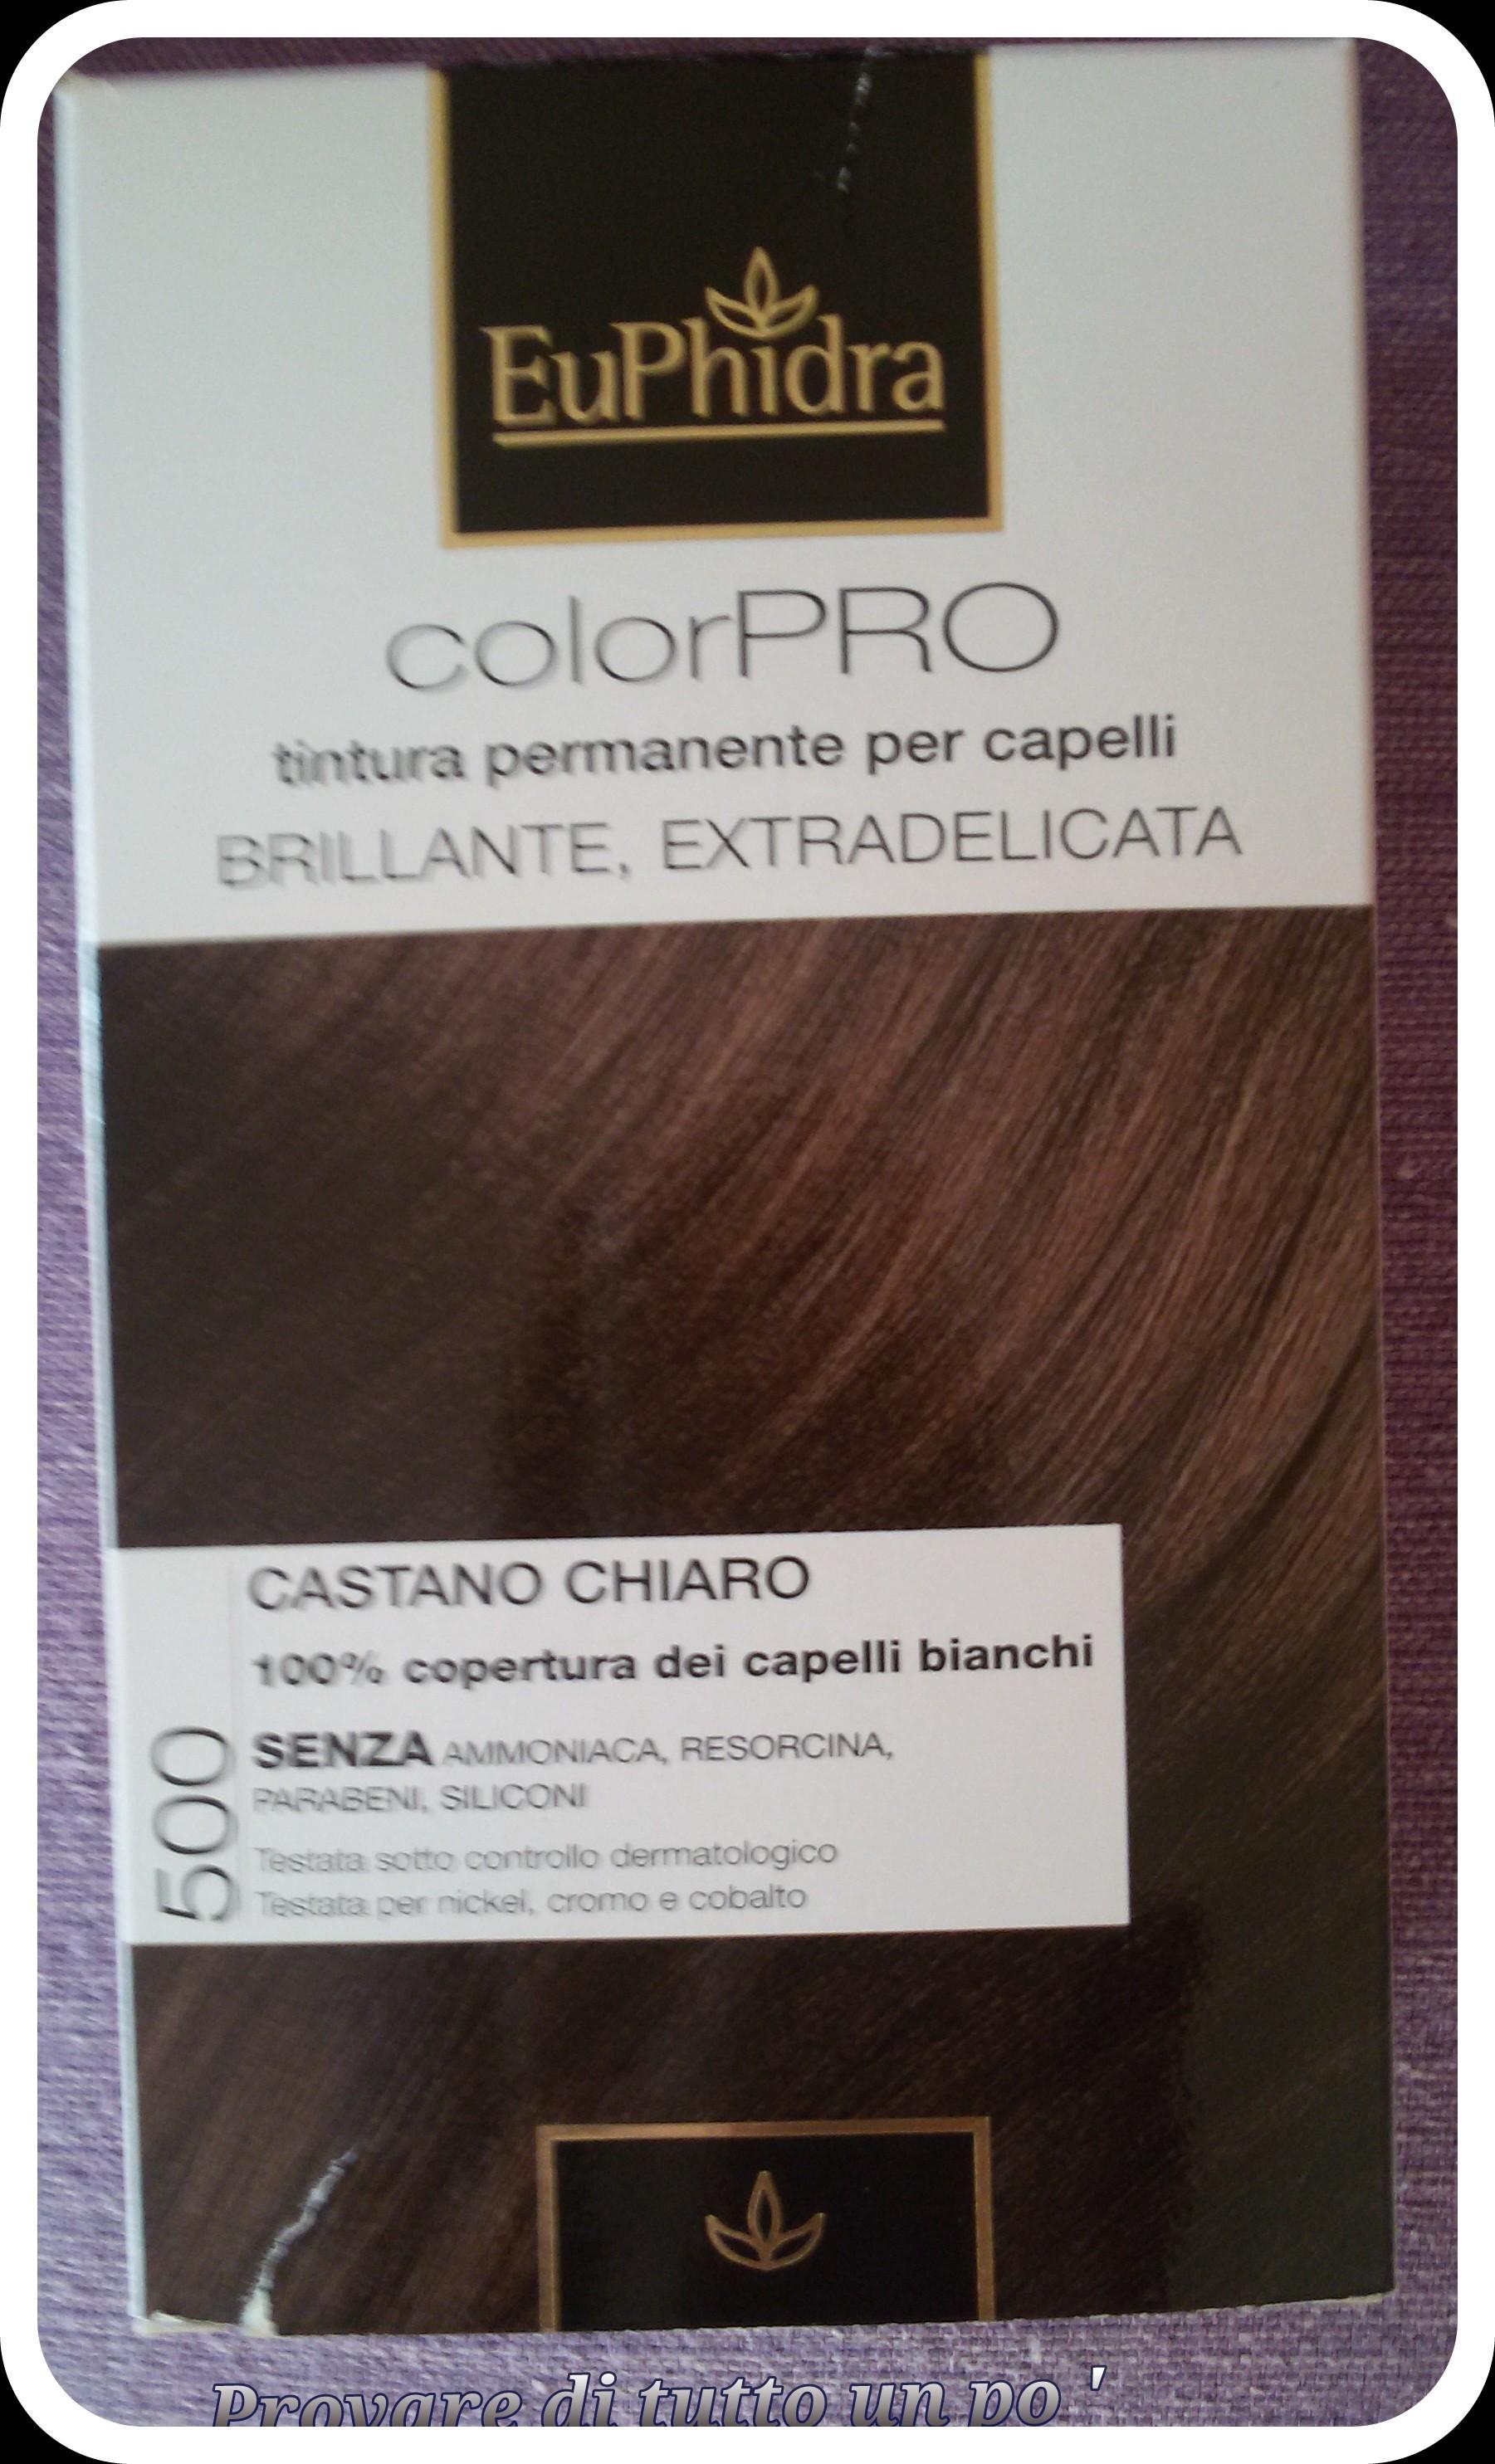 Euphidra Color Pro 2609571f0167